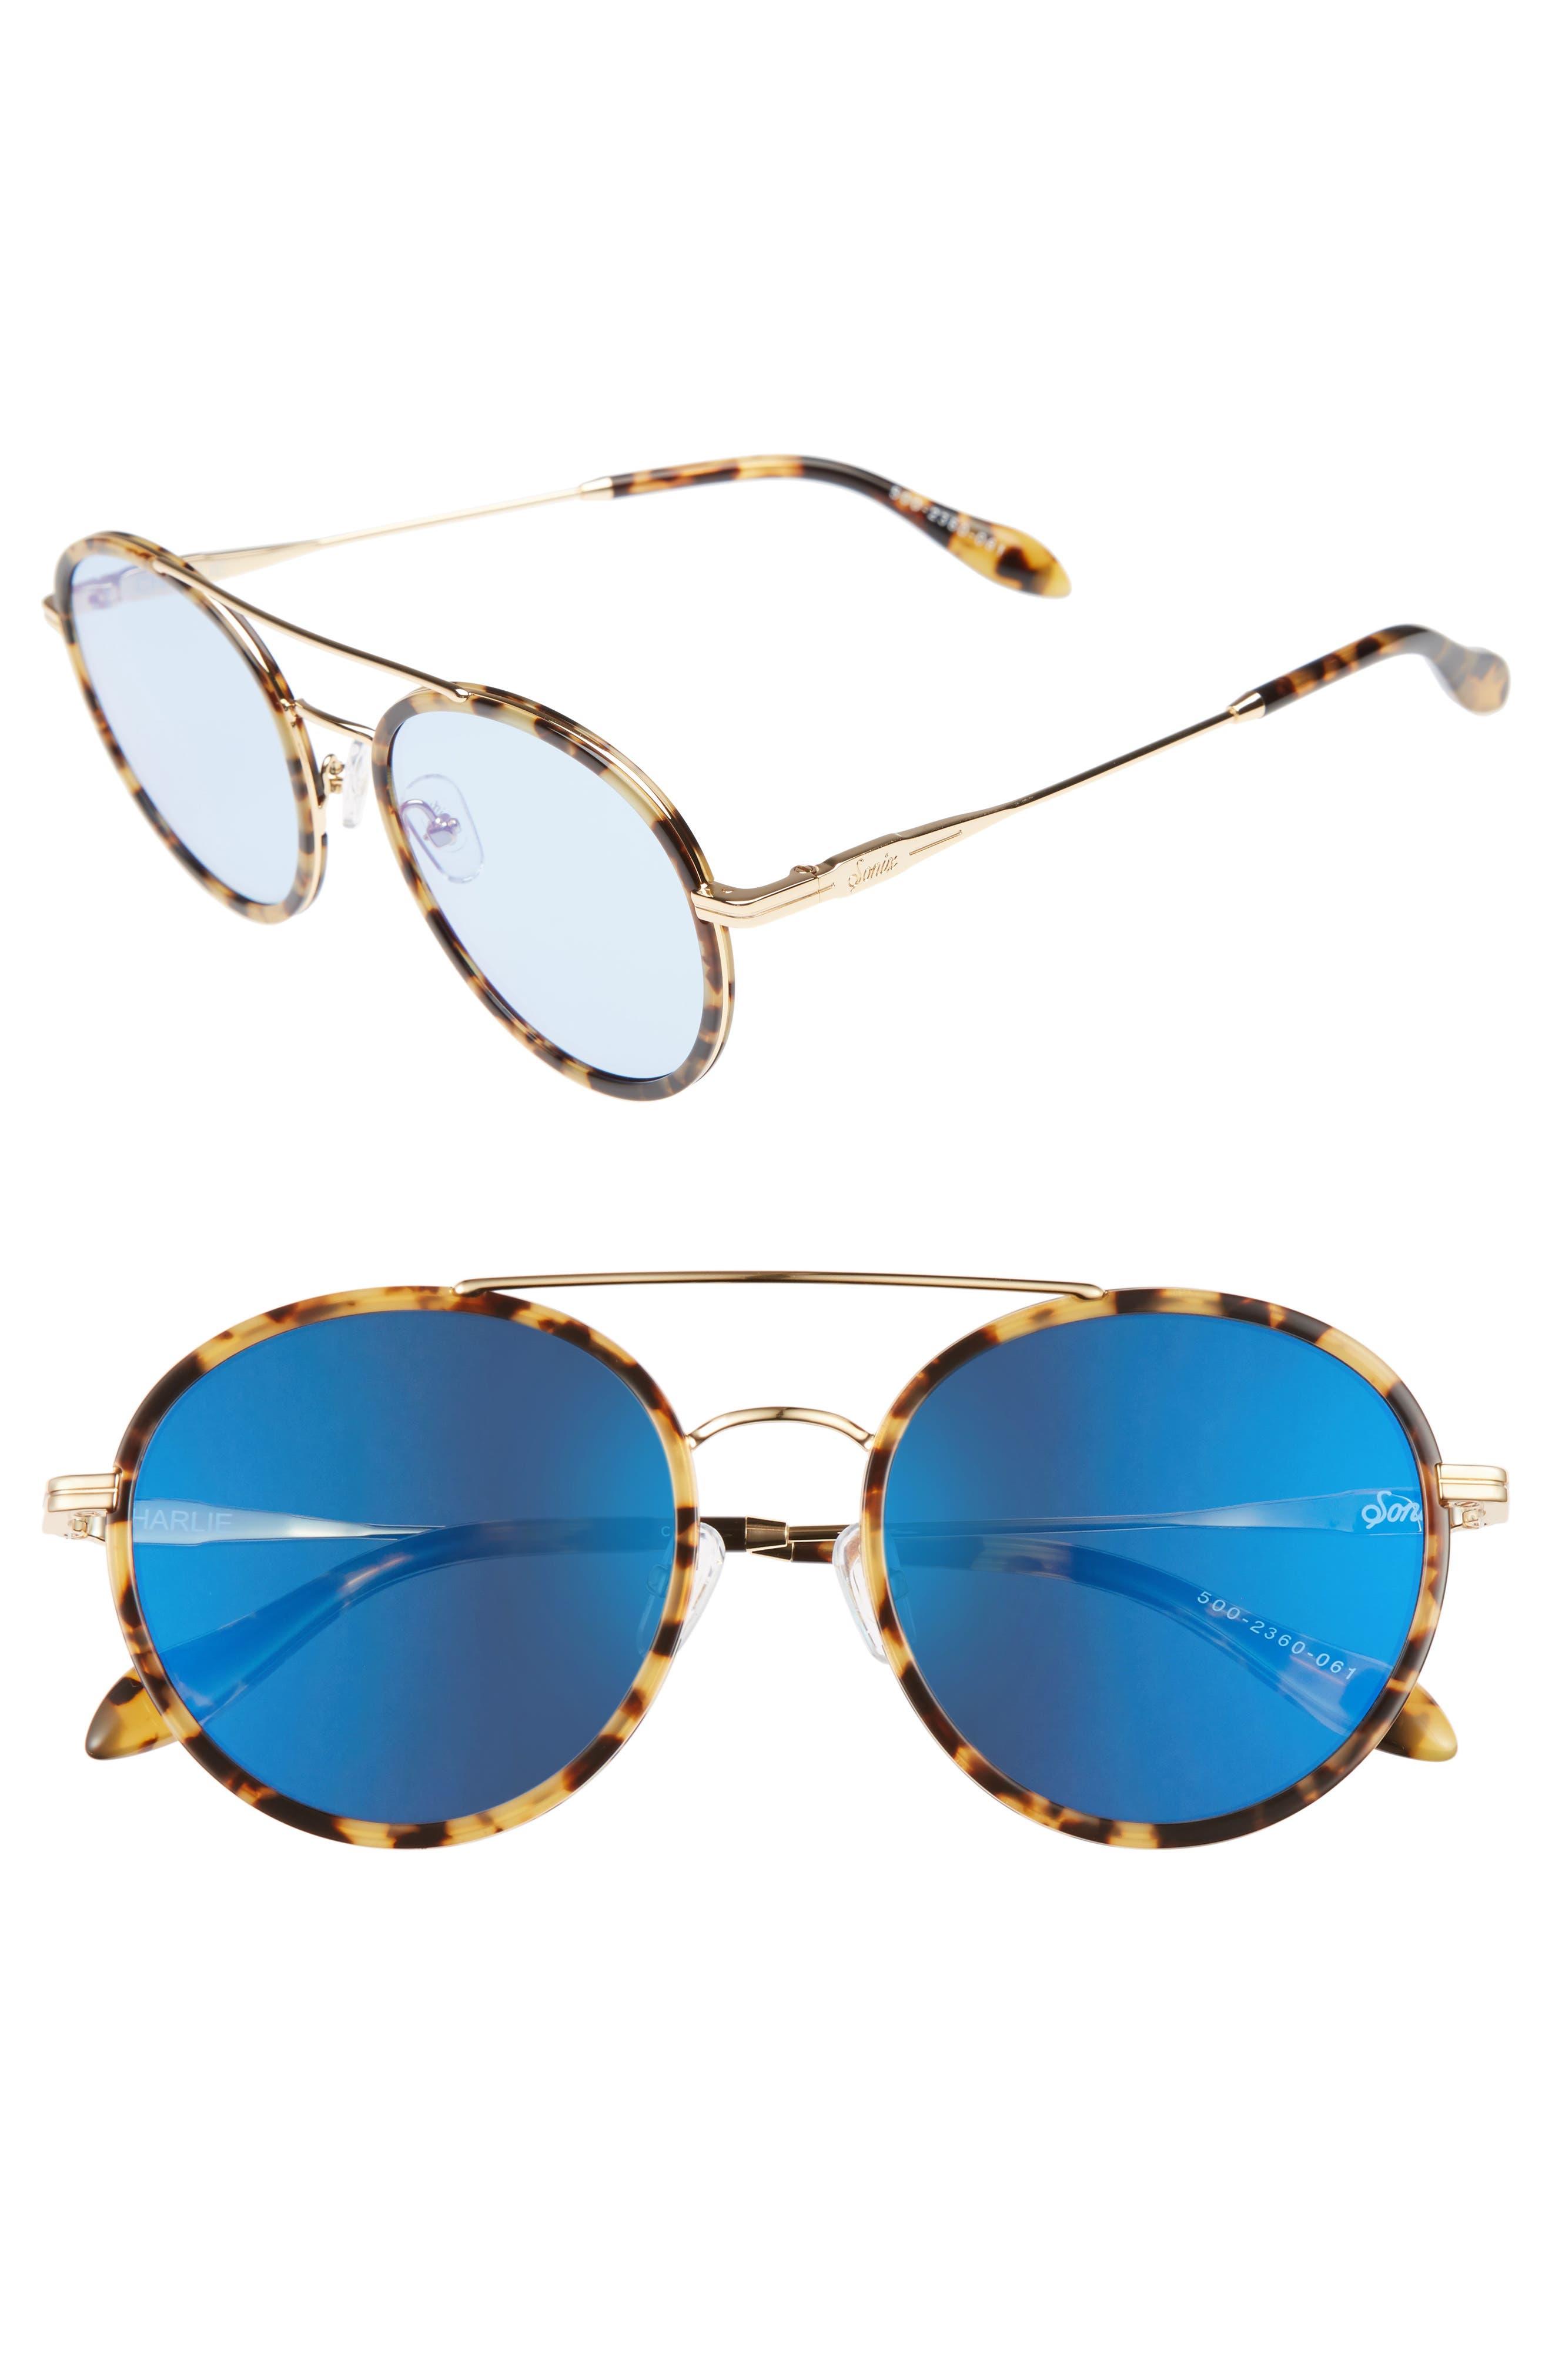 Alternate Image 1 Selected - Sonix Charli 50mm Mirrored Lens Round Sunglasses